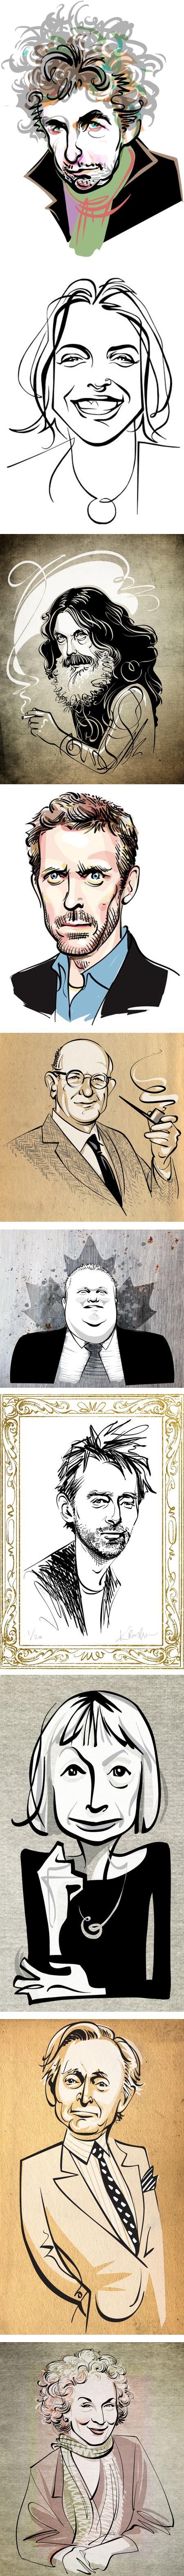 Kathryn Rathke. illustration, digital ink, portraits, caricature